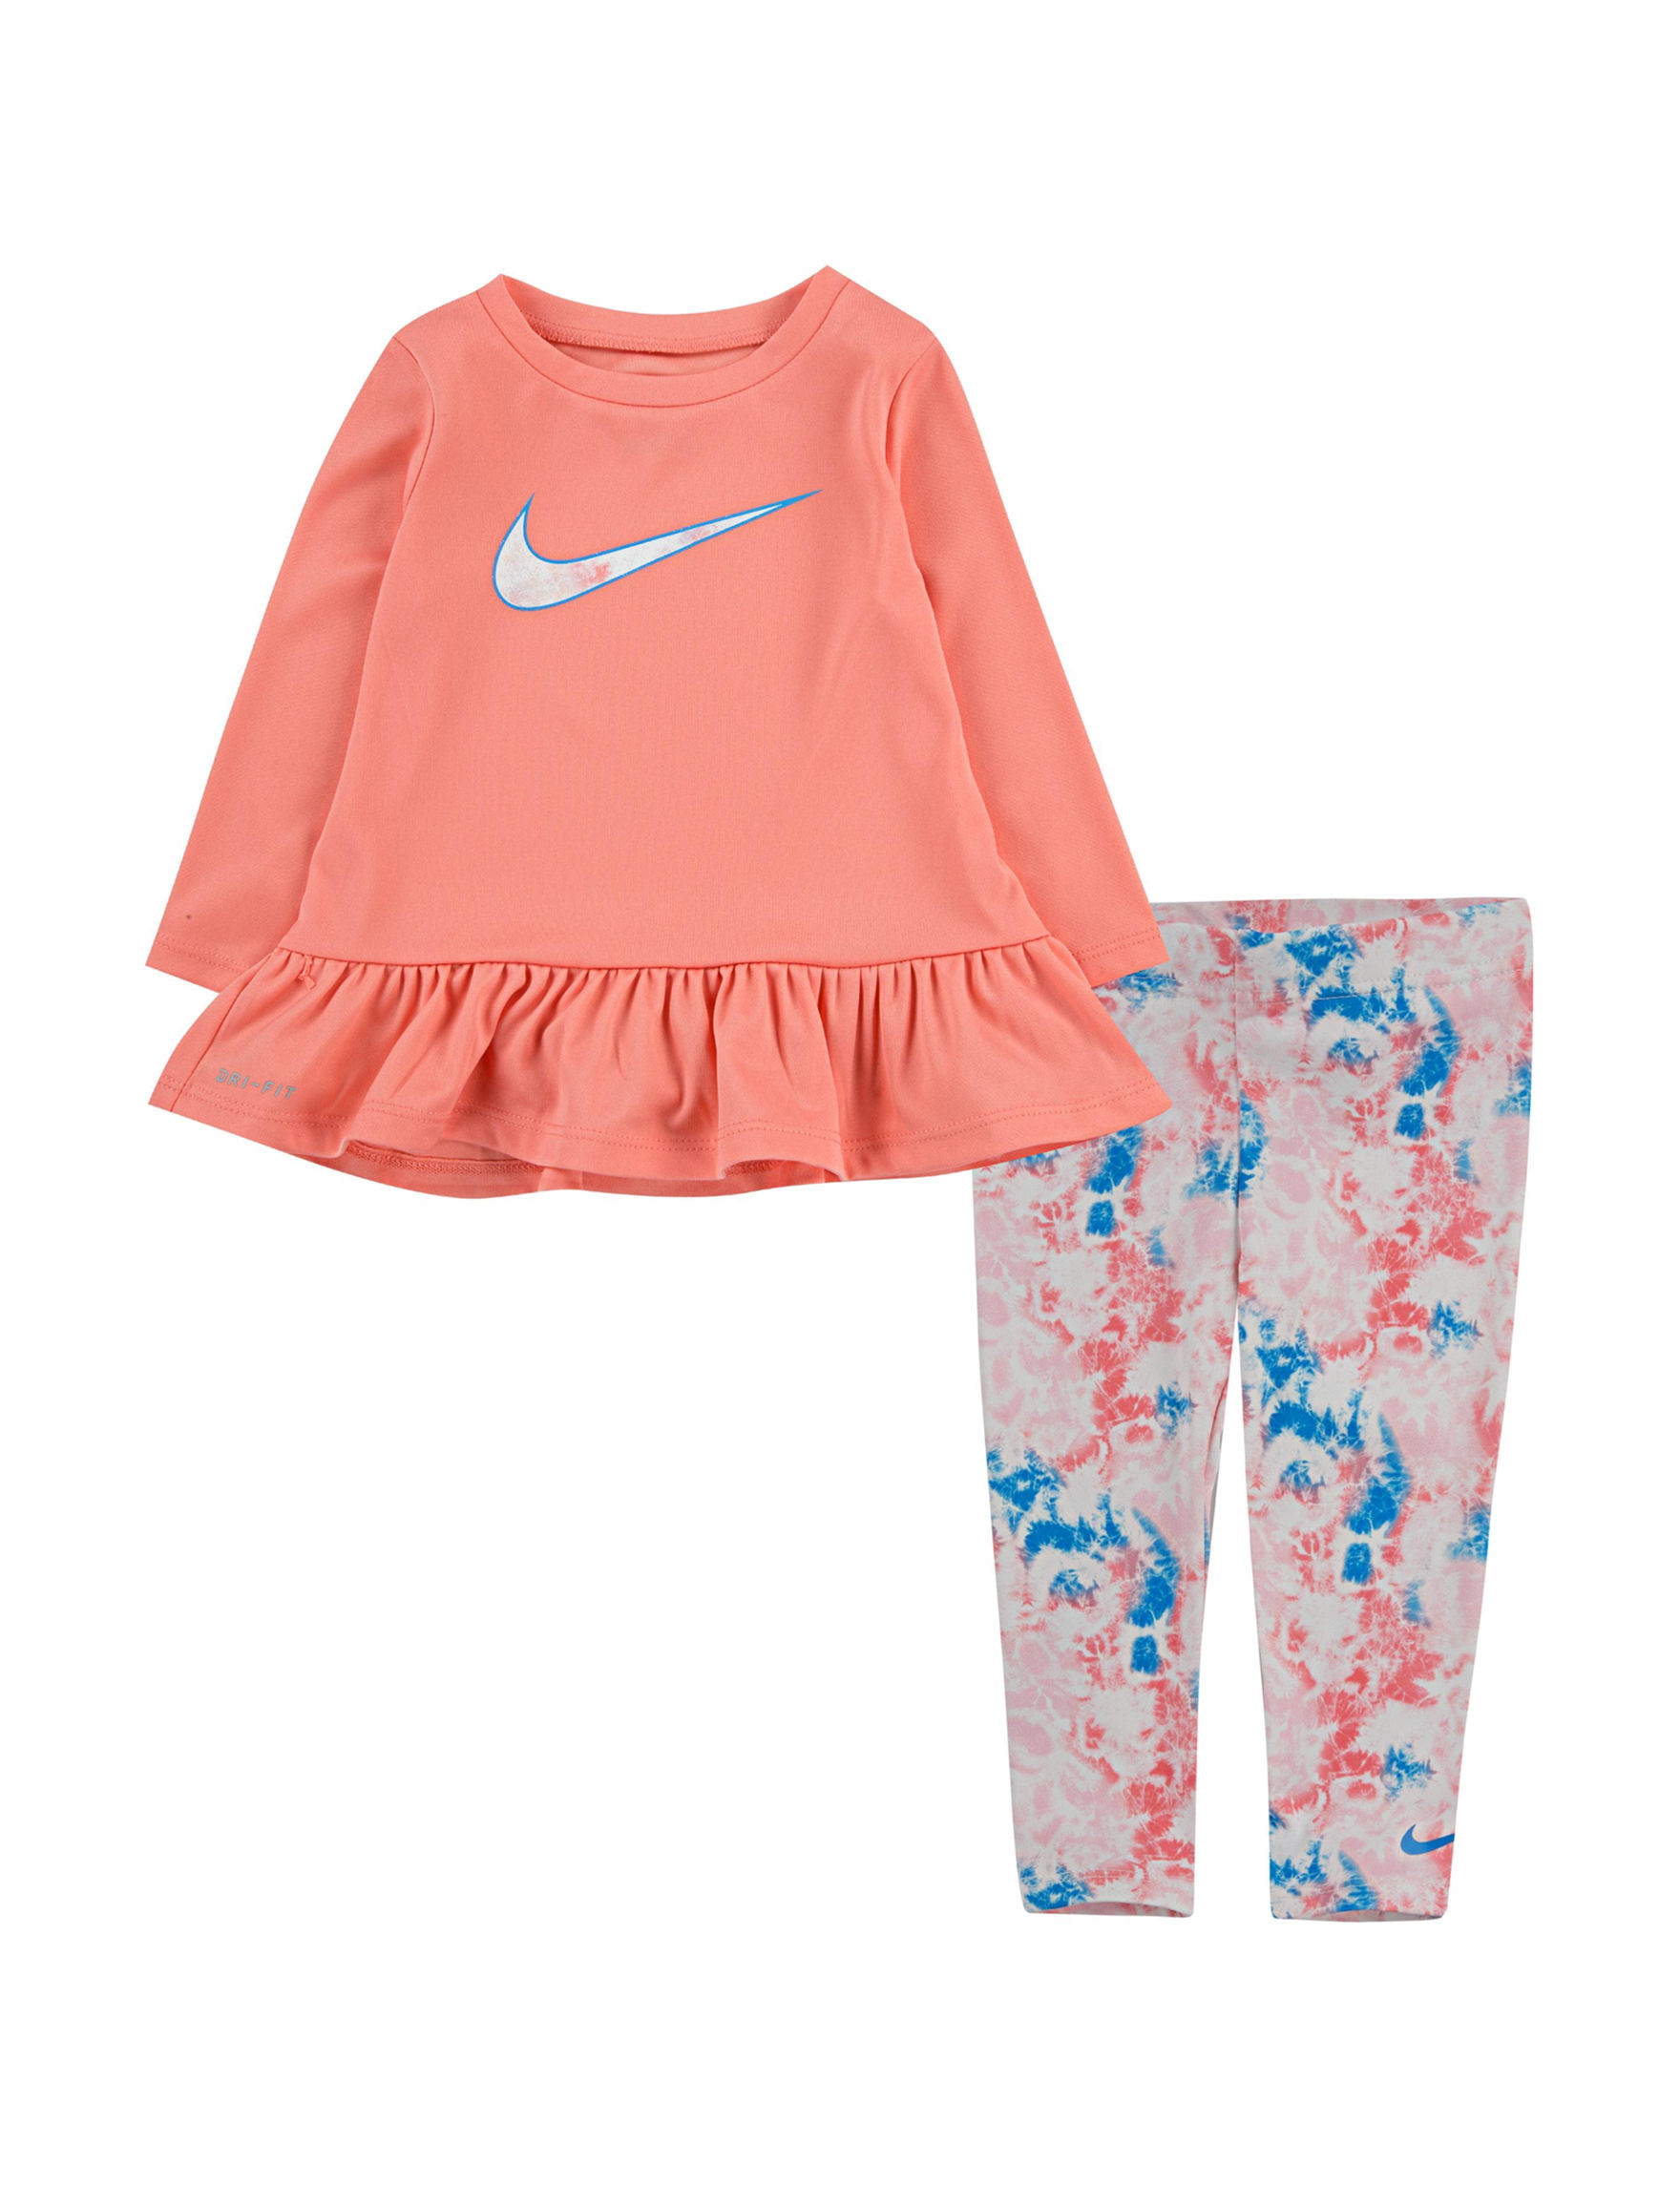 Nike Coral Multi